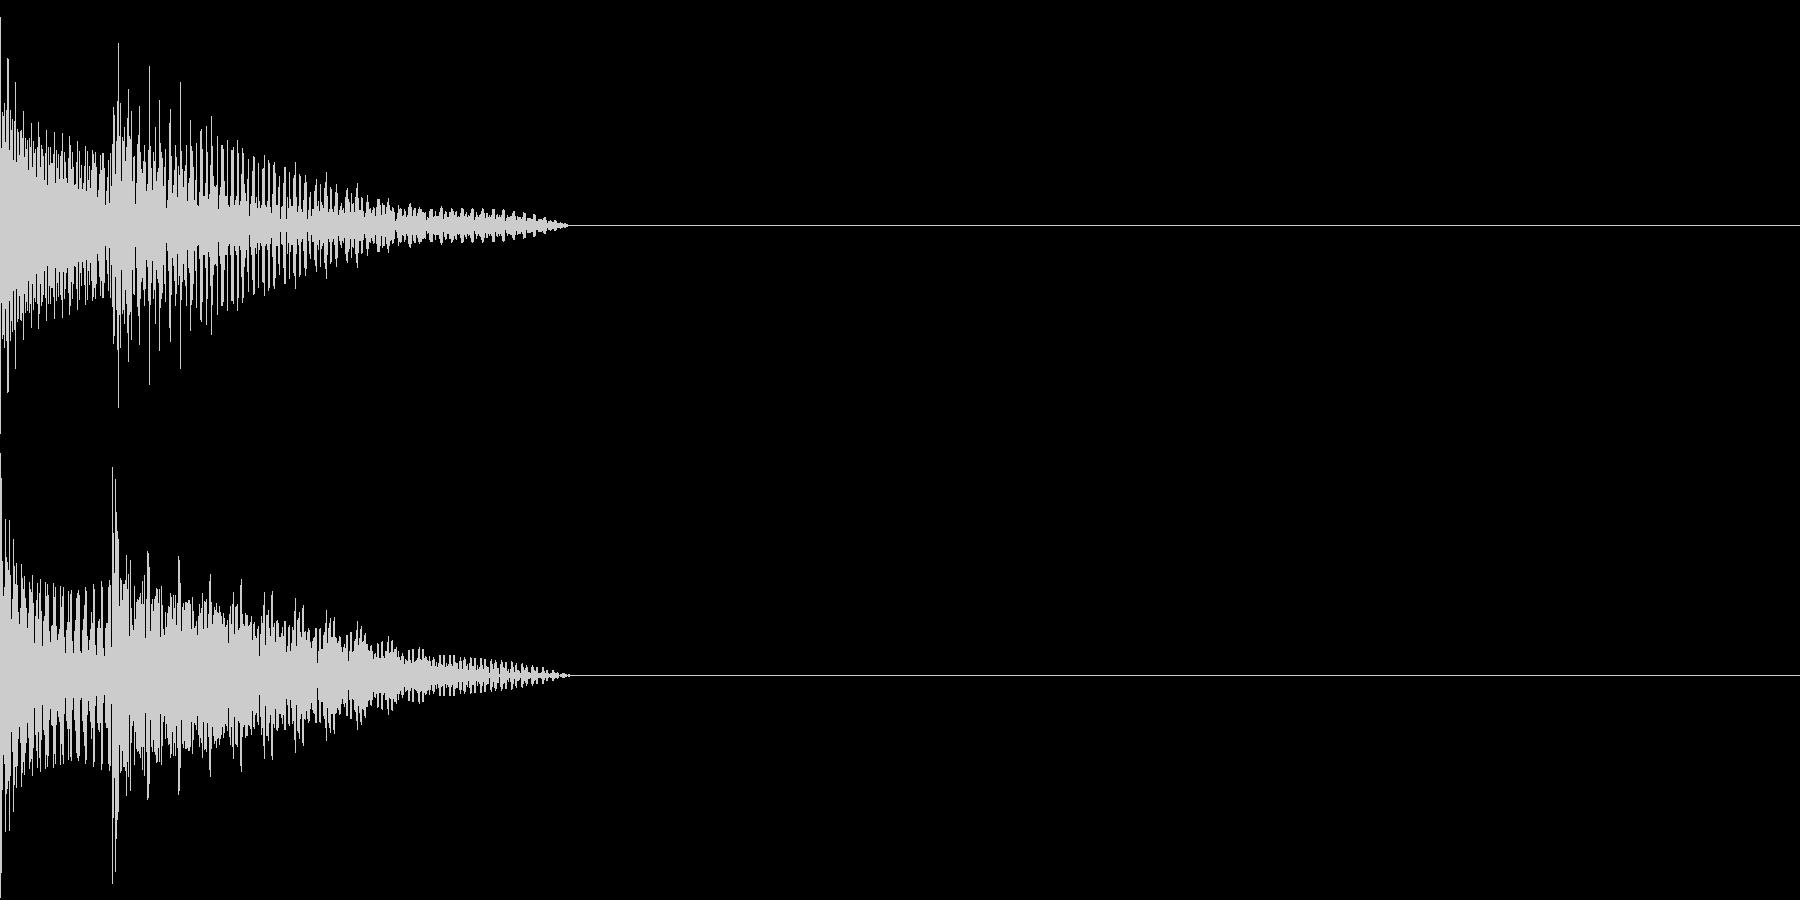 Cursor セレクト・カーソルの音3の未再生の波形